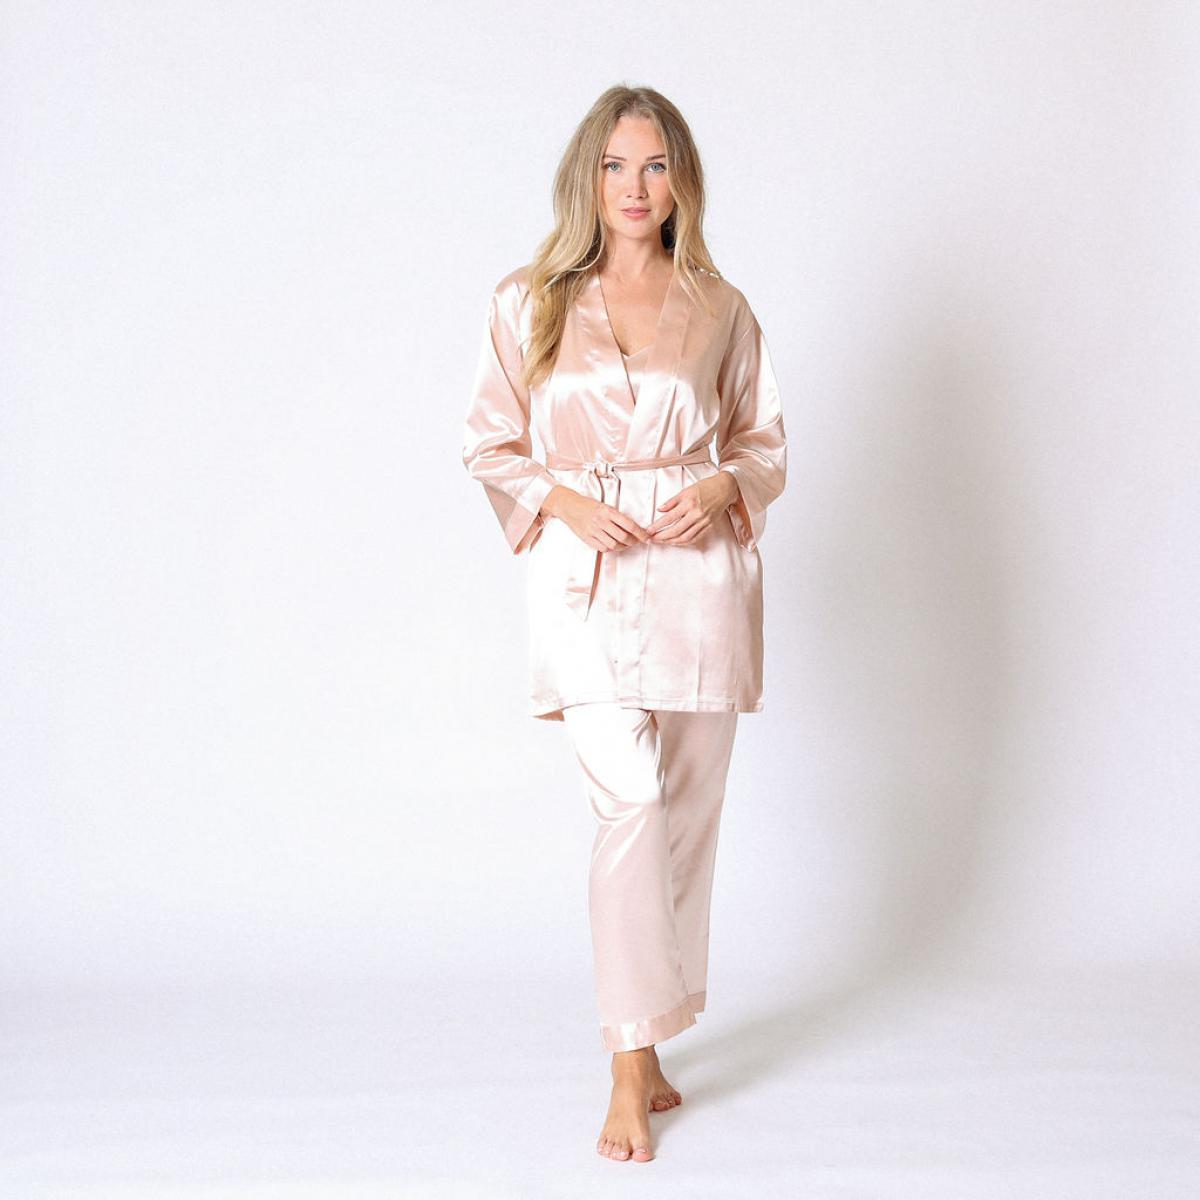 Promo : Ensemble pyjama satin et déshabillié Ivoire - Midnight Lingerie - Modalova